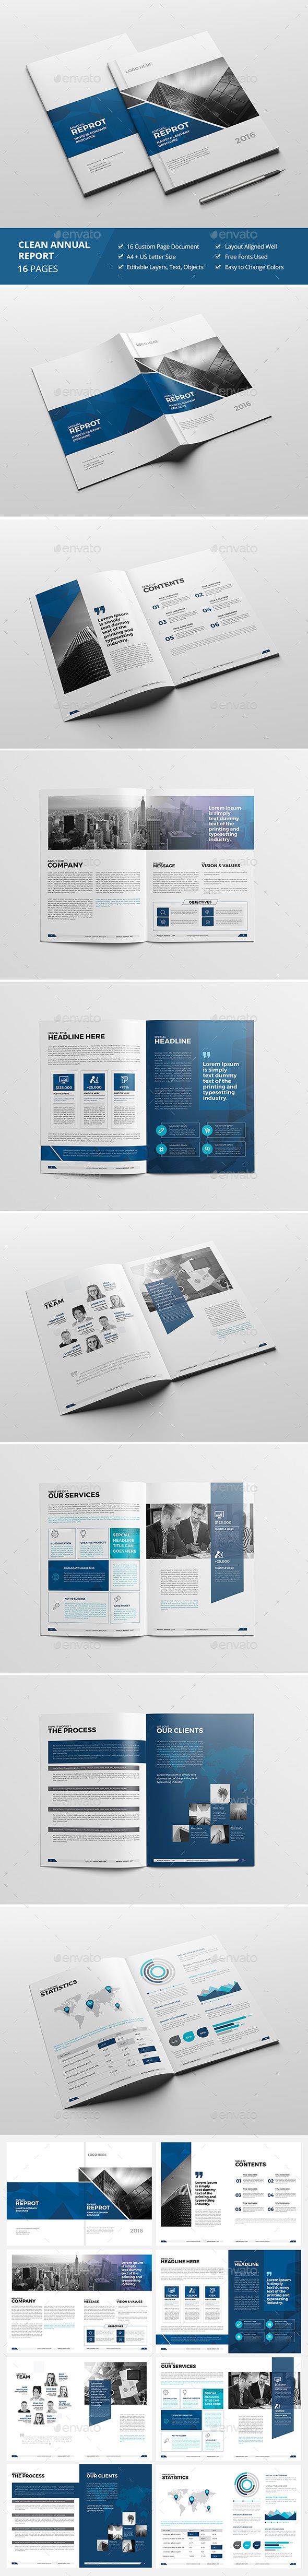 25 best ideas about brochure template on pinterest booklet layout brochure design and. Black Bedroom Furniture Sets. Home Design Ideas